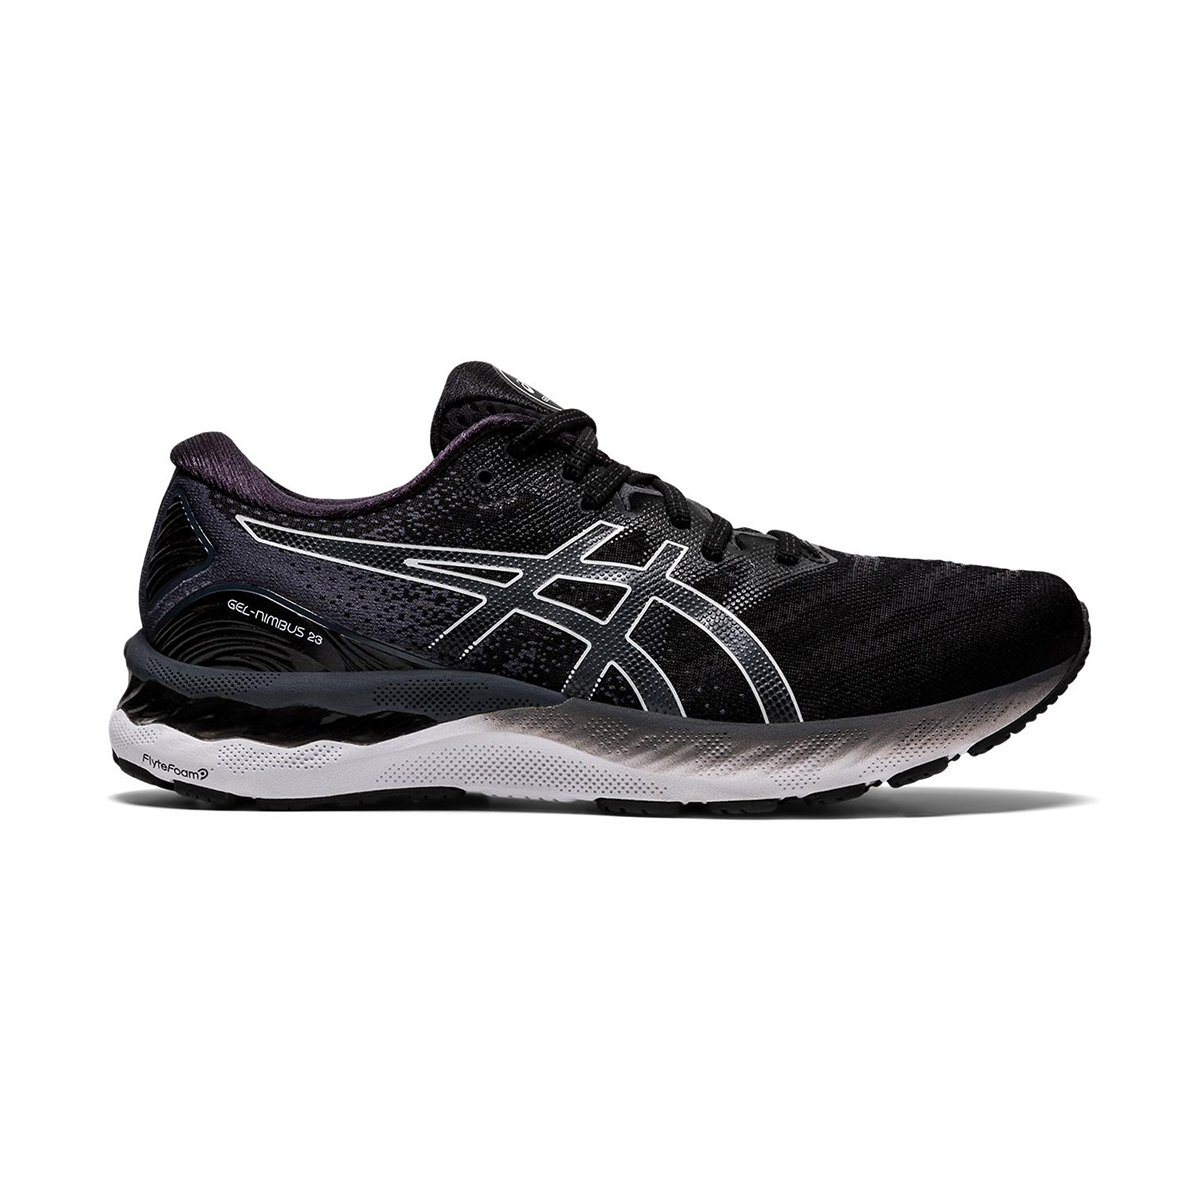 Men's Asics GEL-Nimbus 23 Running Shoe - Color: Black/White - Size: 7 - Width: Regular, Black/White, large, image 1